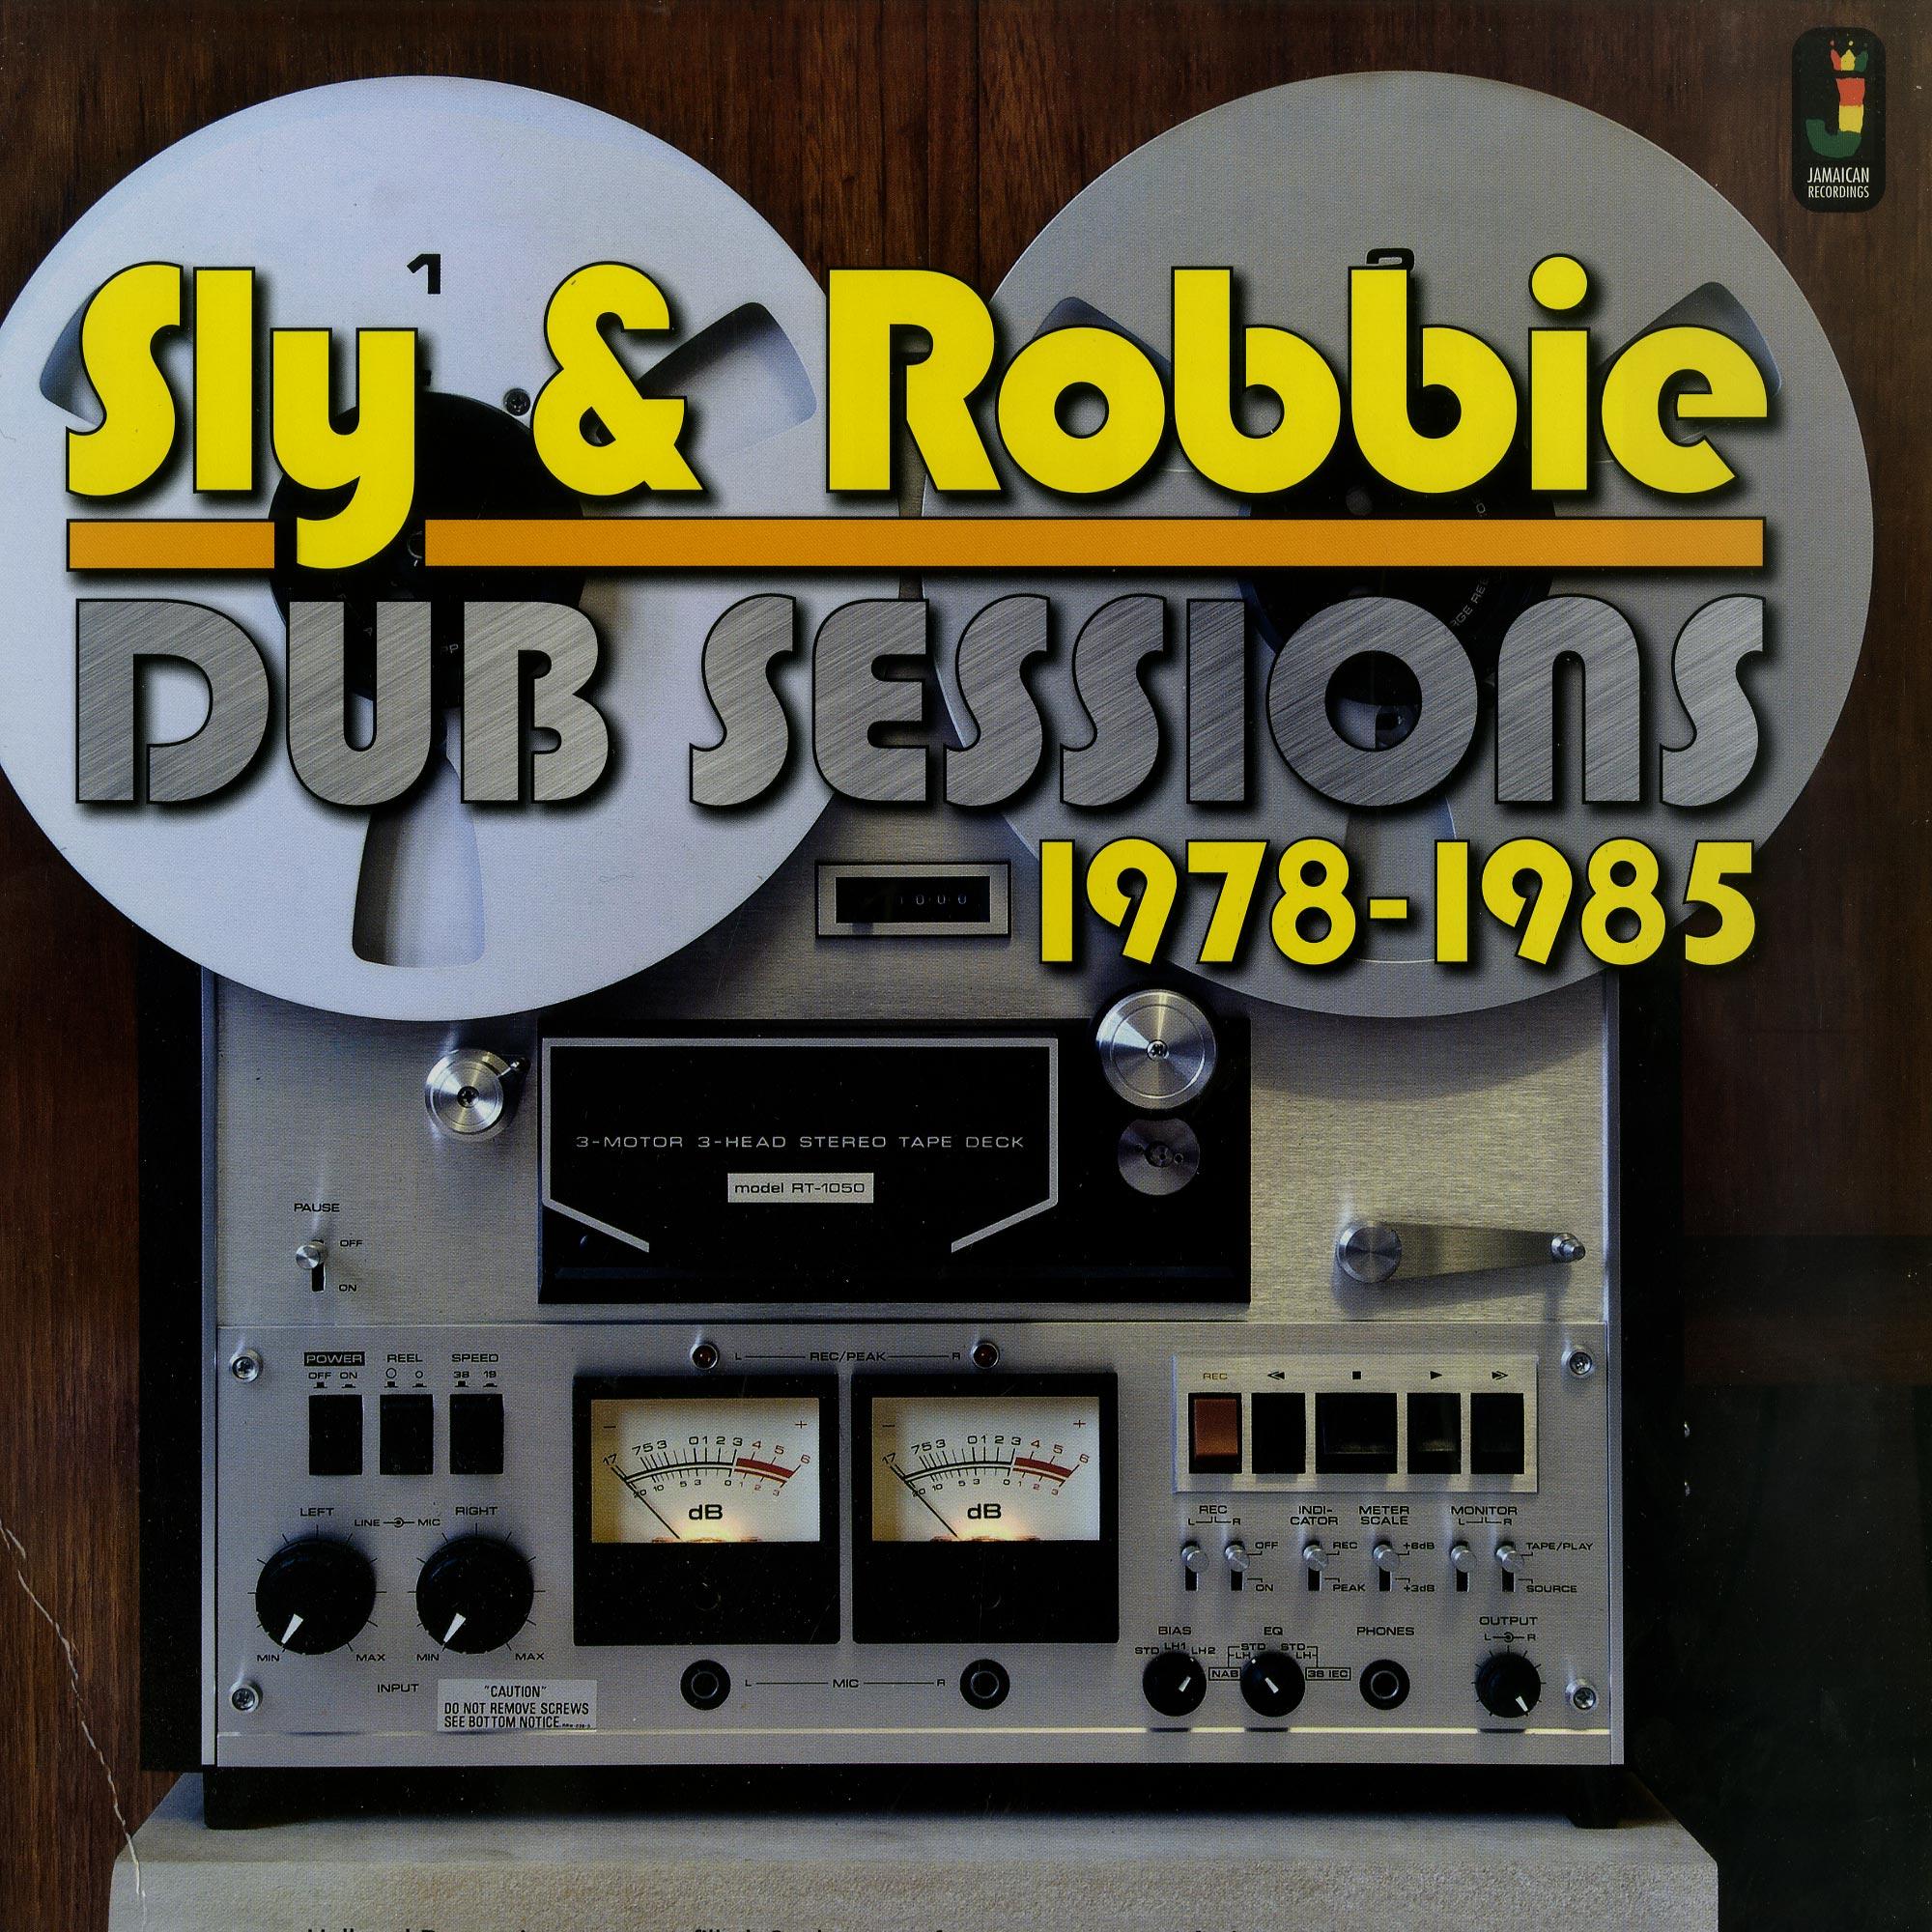 Sly & Robbie - DUB SESSIONS 1978 - 1985